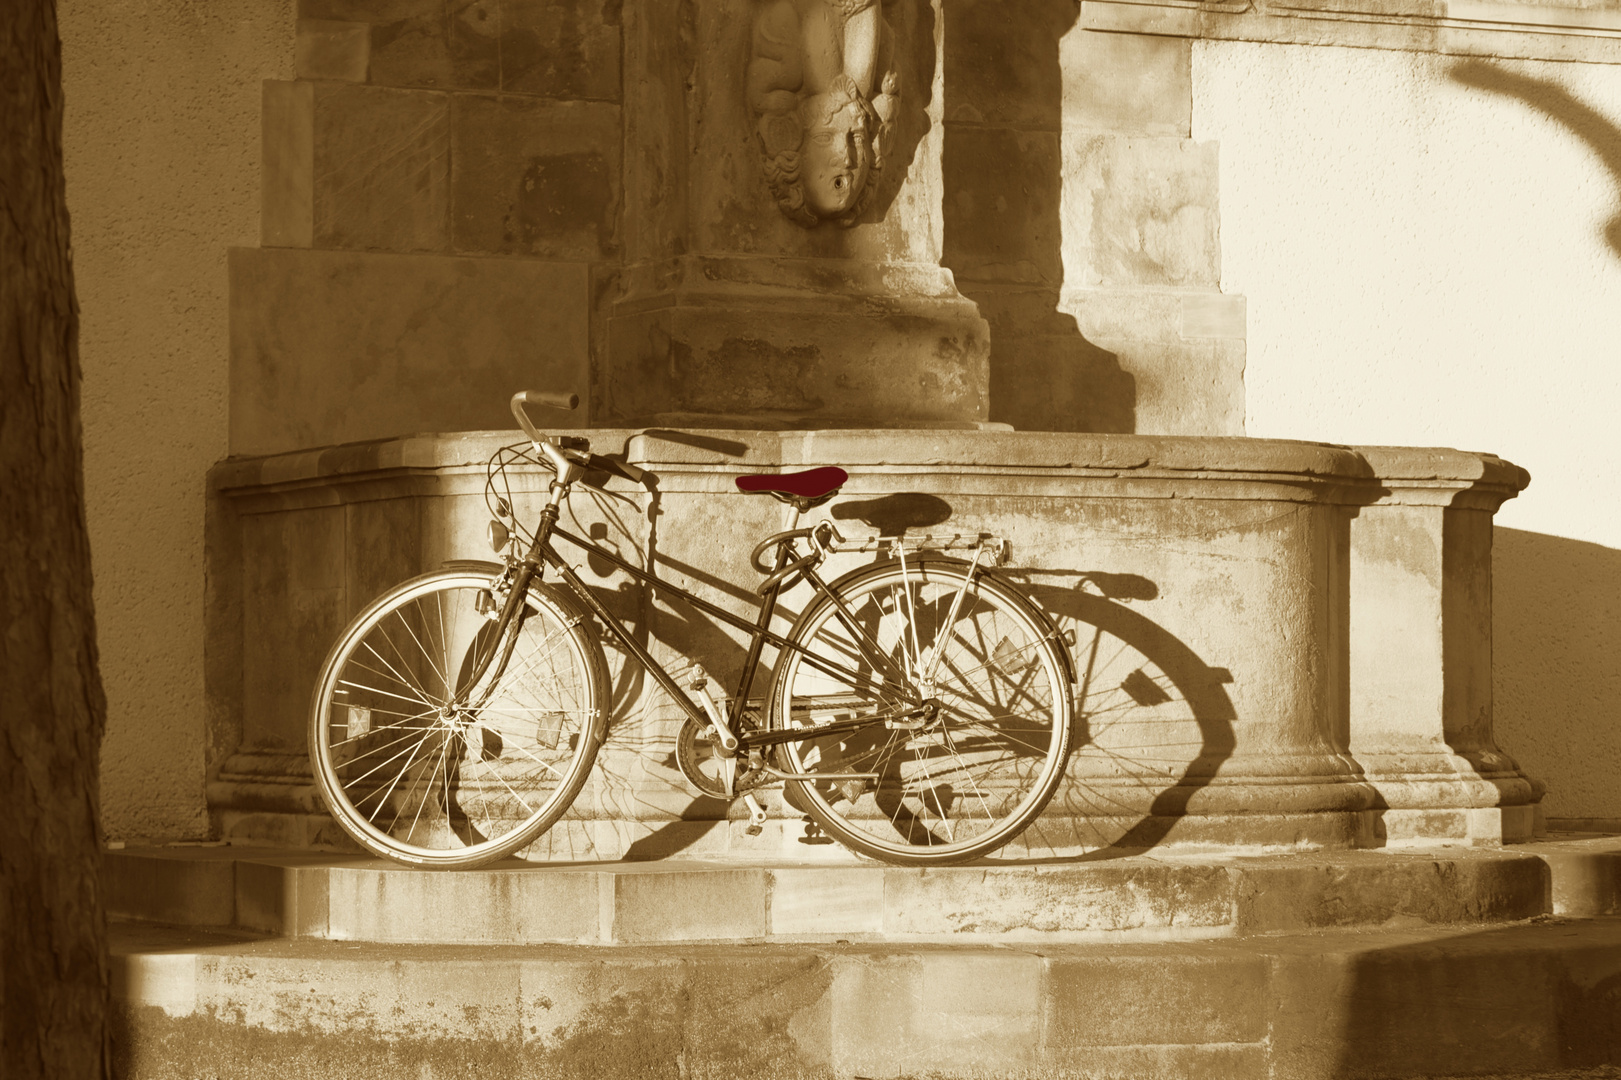 Fahrrad in der Abendsonne